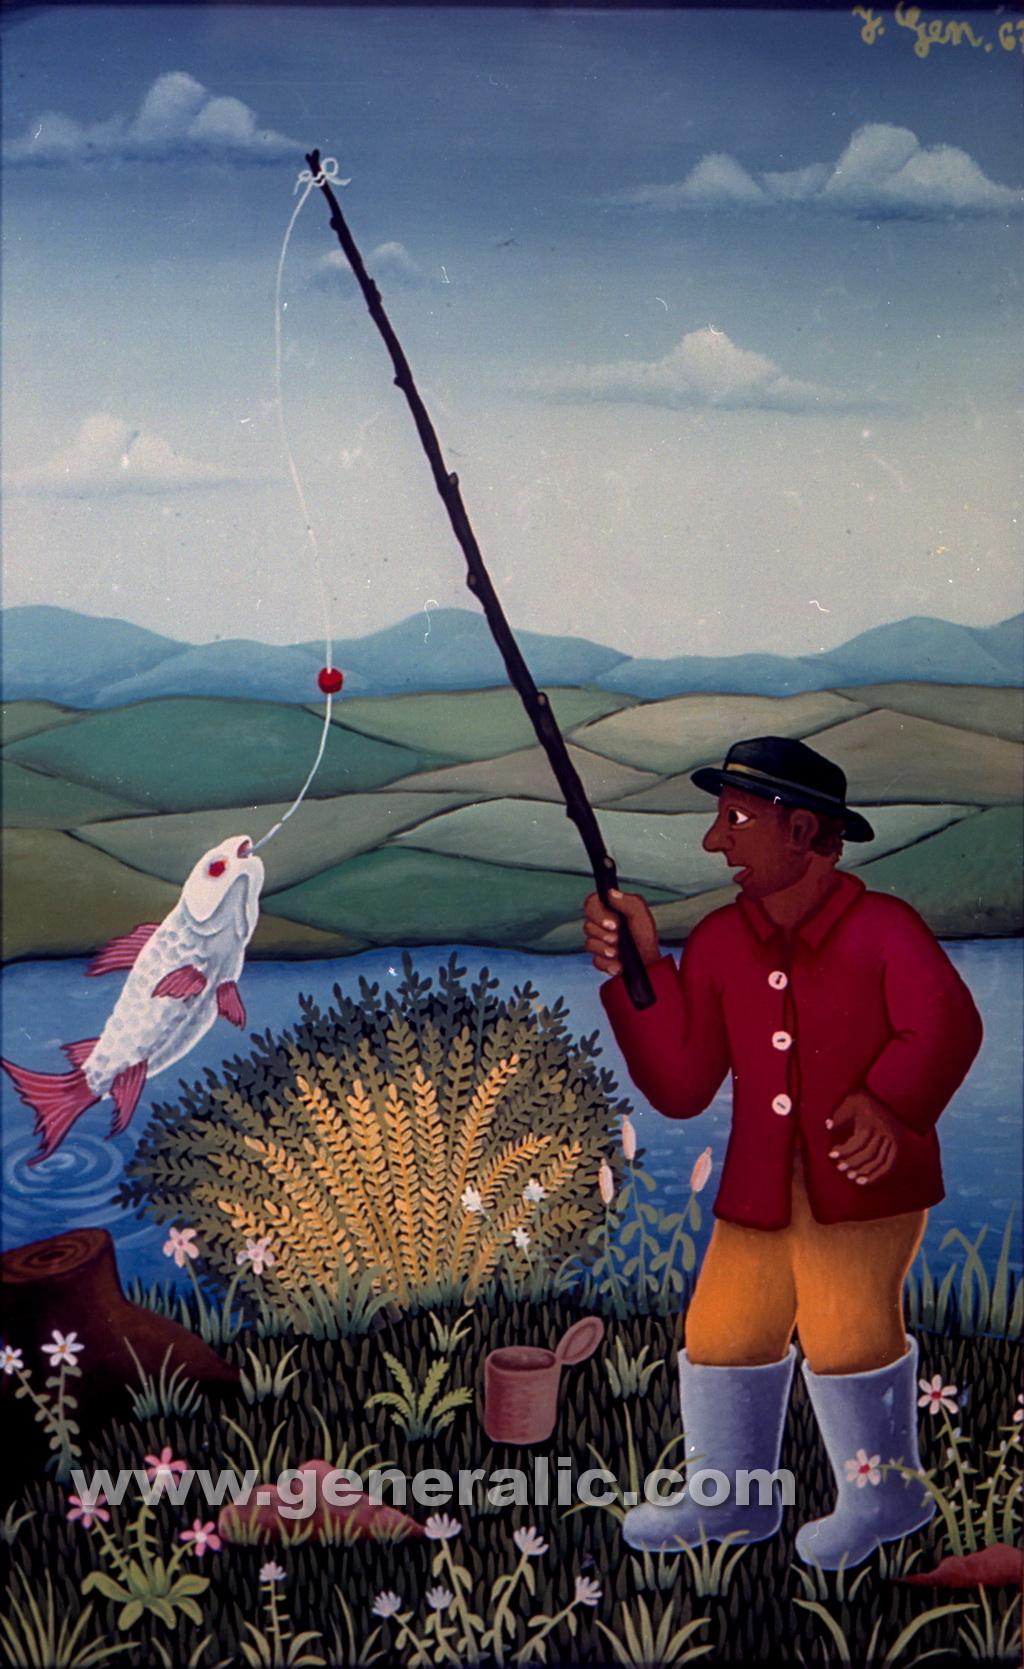 Josip Generalic, 1967, Fisherman, oil on glass